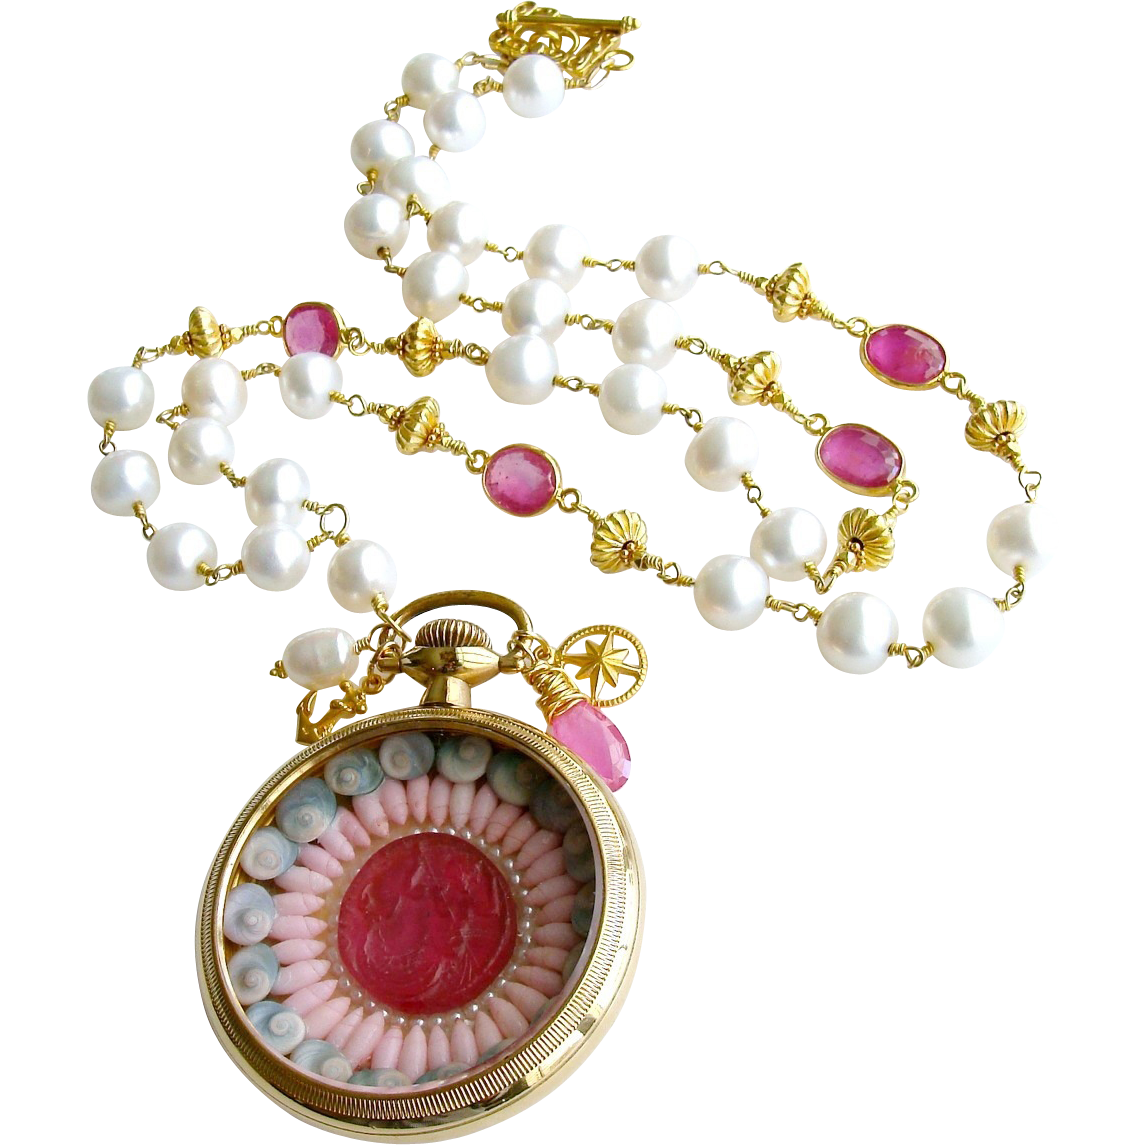 Sailor's Valentine Shell Mosaic Intaglio Cameo Pocket Watch Pink Sapphire Baroque Cultured Pearls Necklace - Capraia Sailor's Valentine Necklace